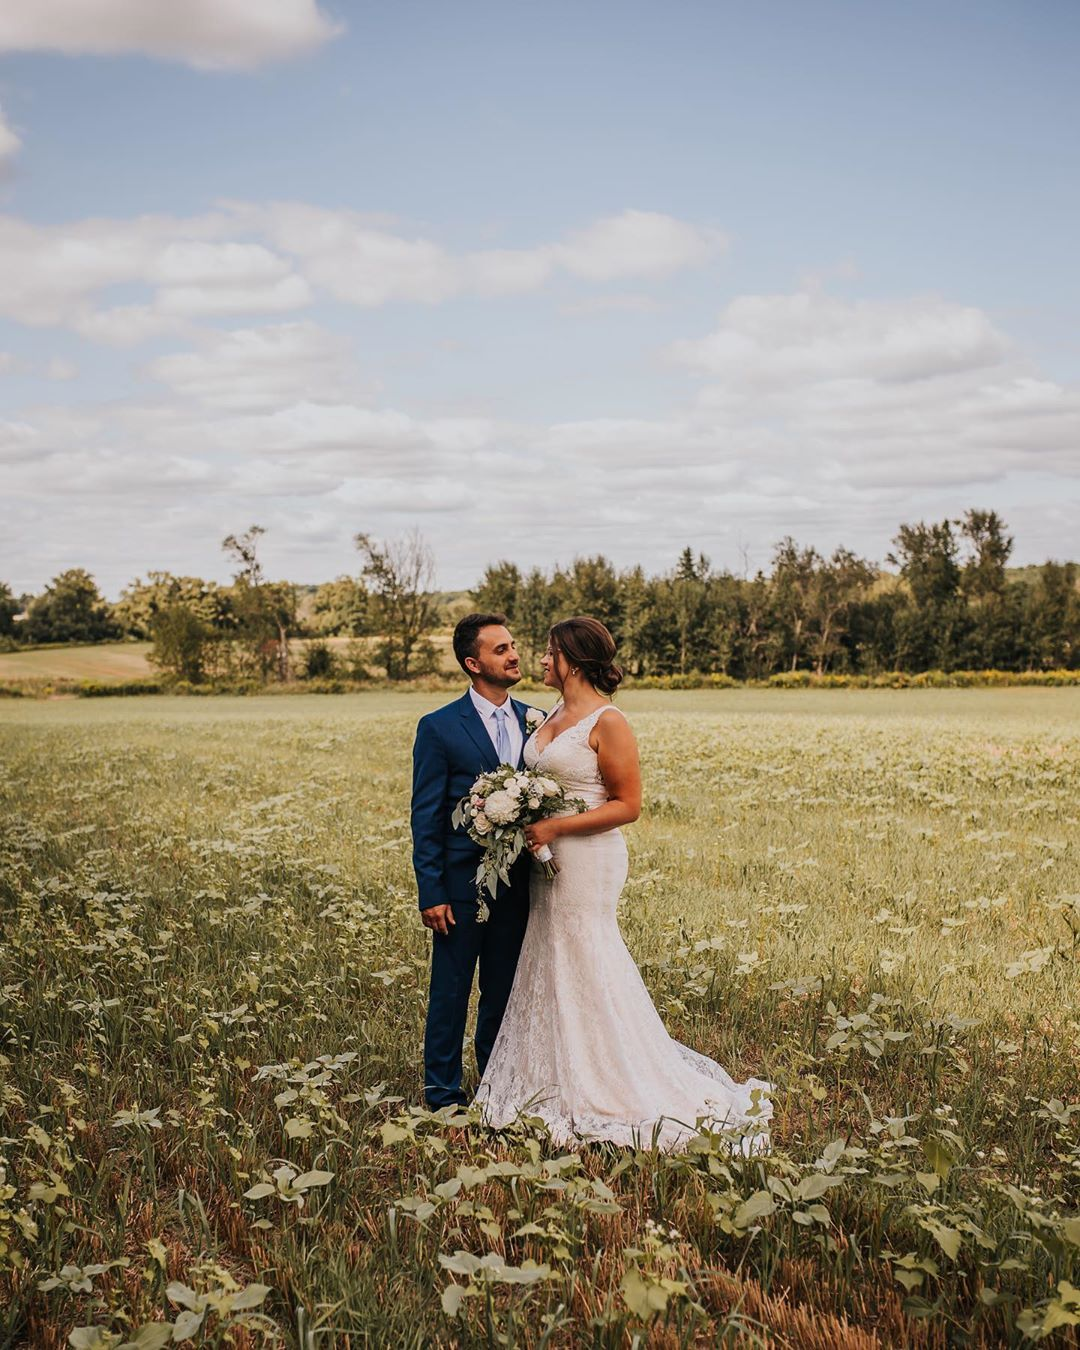 Emily Kislom Nbsp Nbsp Weddingphotography Nbsp Nbsp Nbsp Nbsp Wedding Nbsp Nbsp Nbsp Nbsp Weddingphotographer Nbsp Nbsp Nbsp N